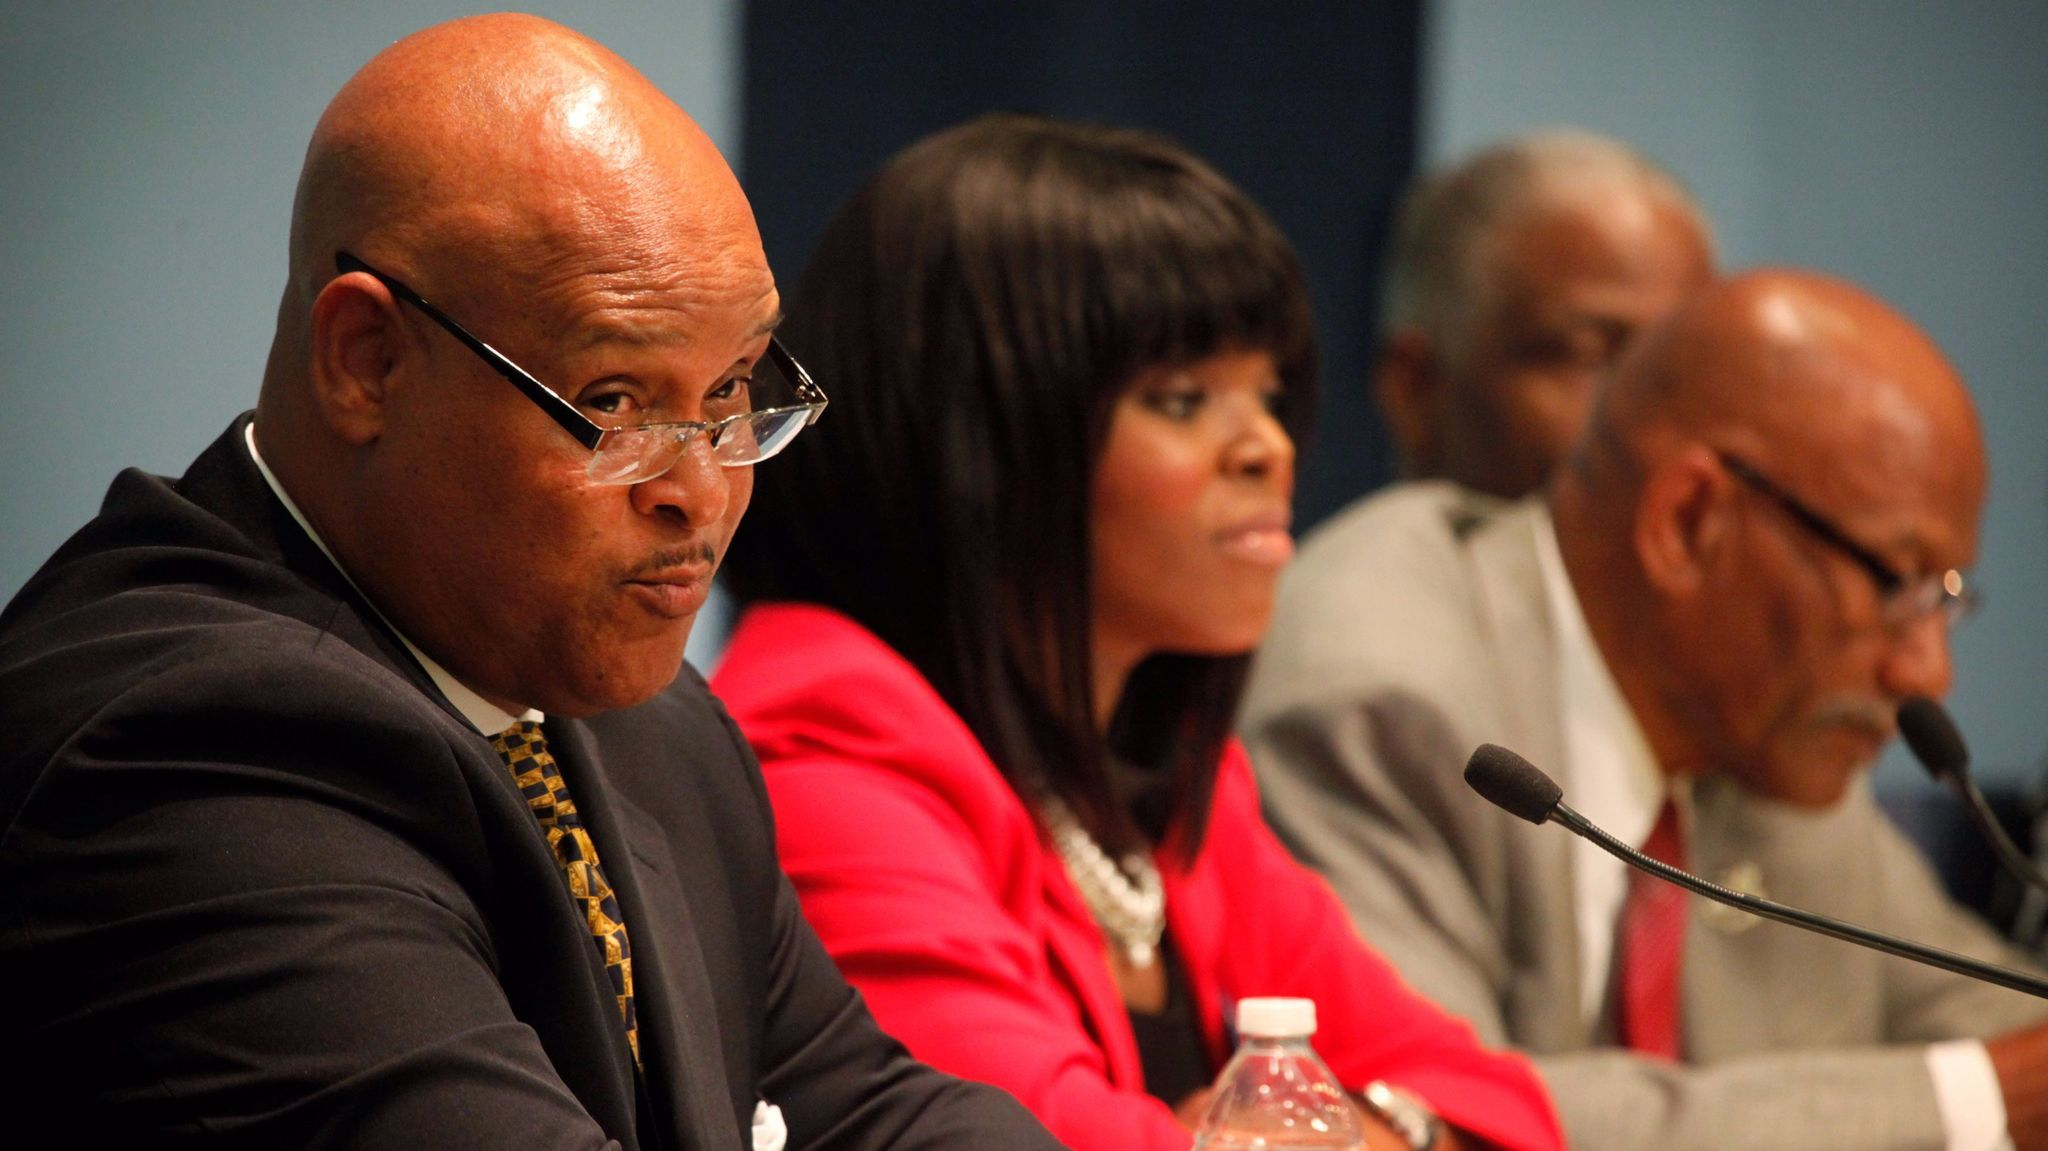 Omar Bradley and Aja Brown speak at a mayoral candidate forum in 2013.